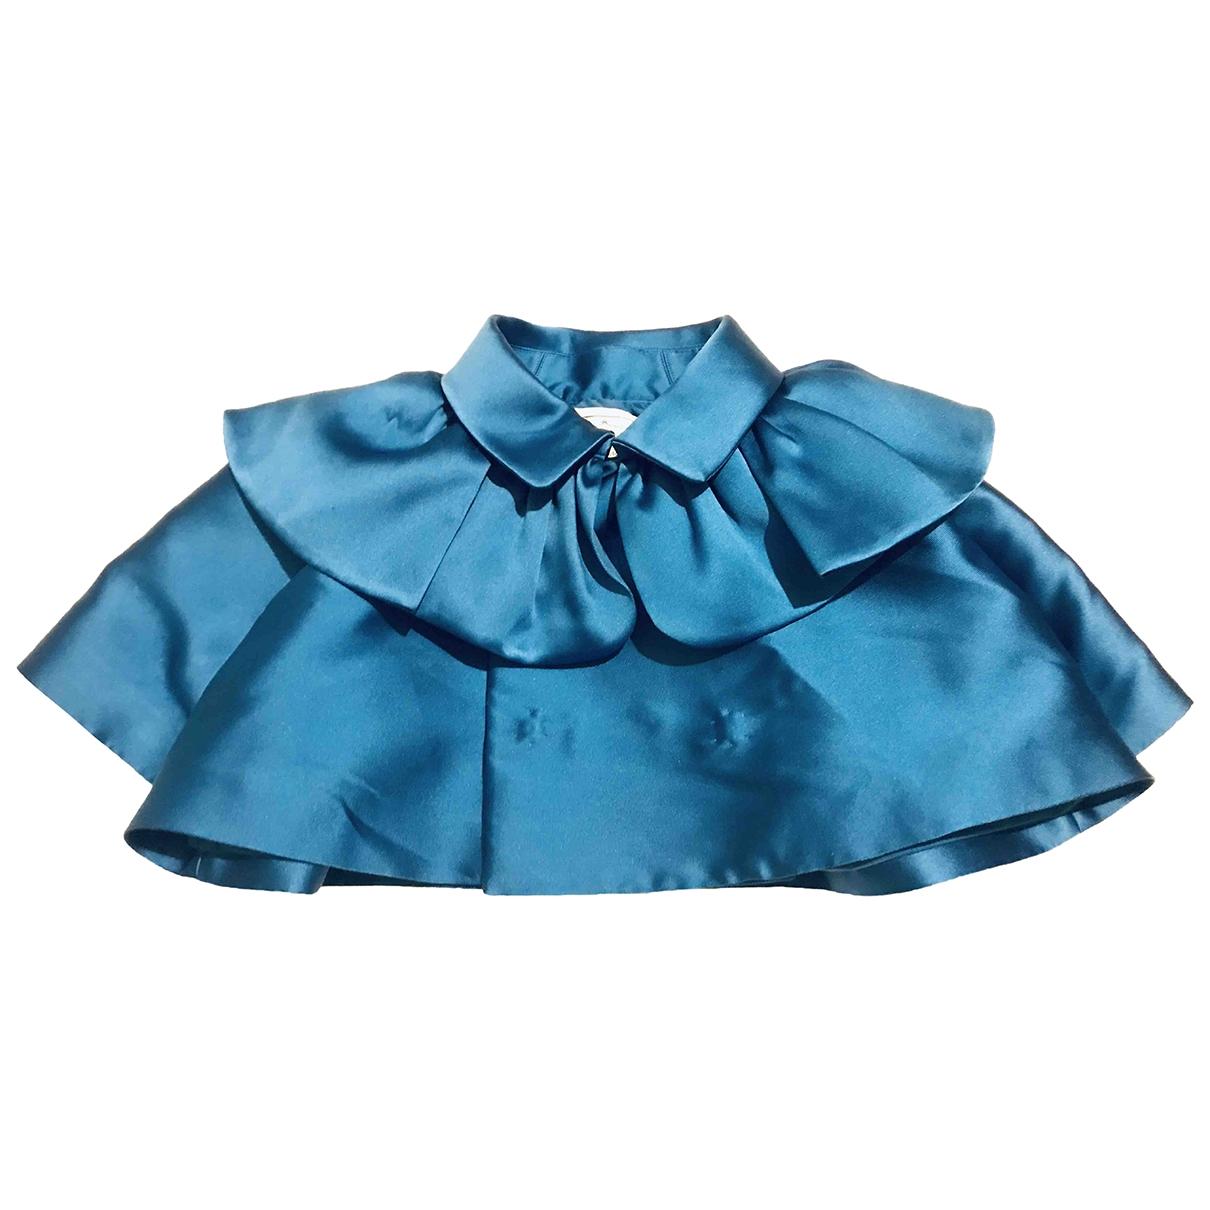 Dsquared2 \N Jacke in  Blau Polyester